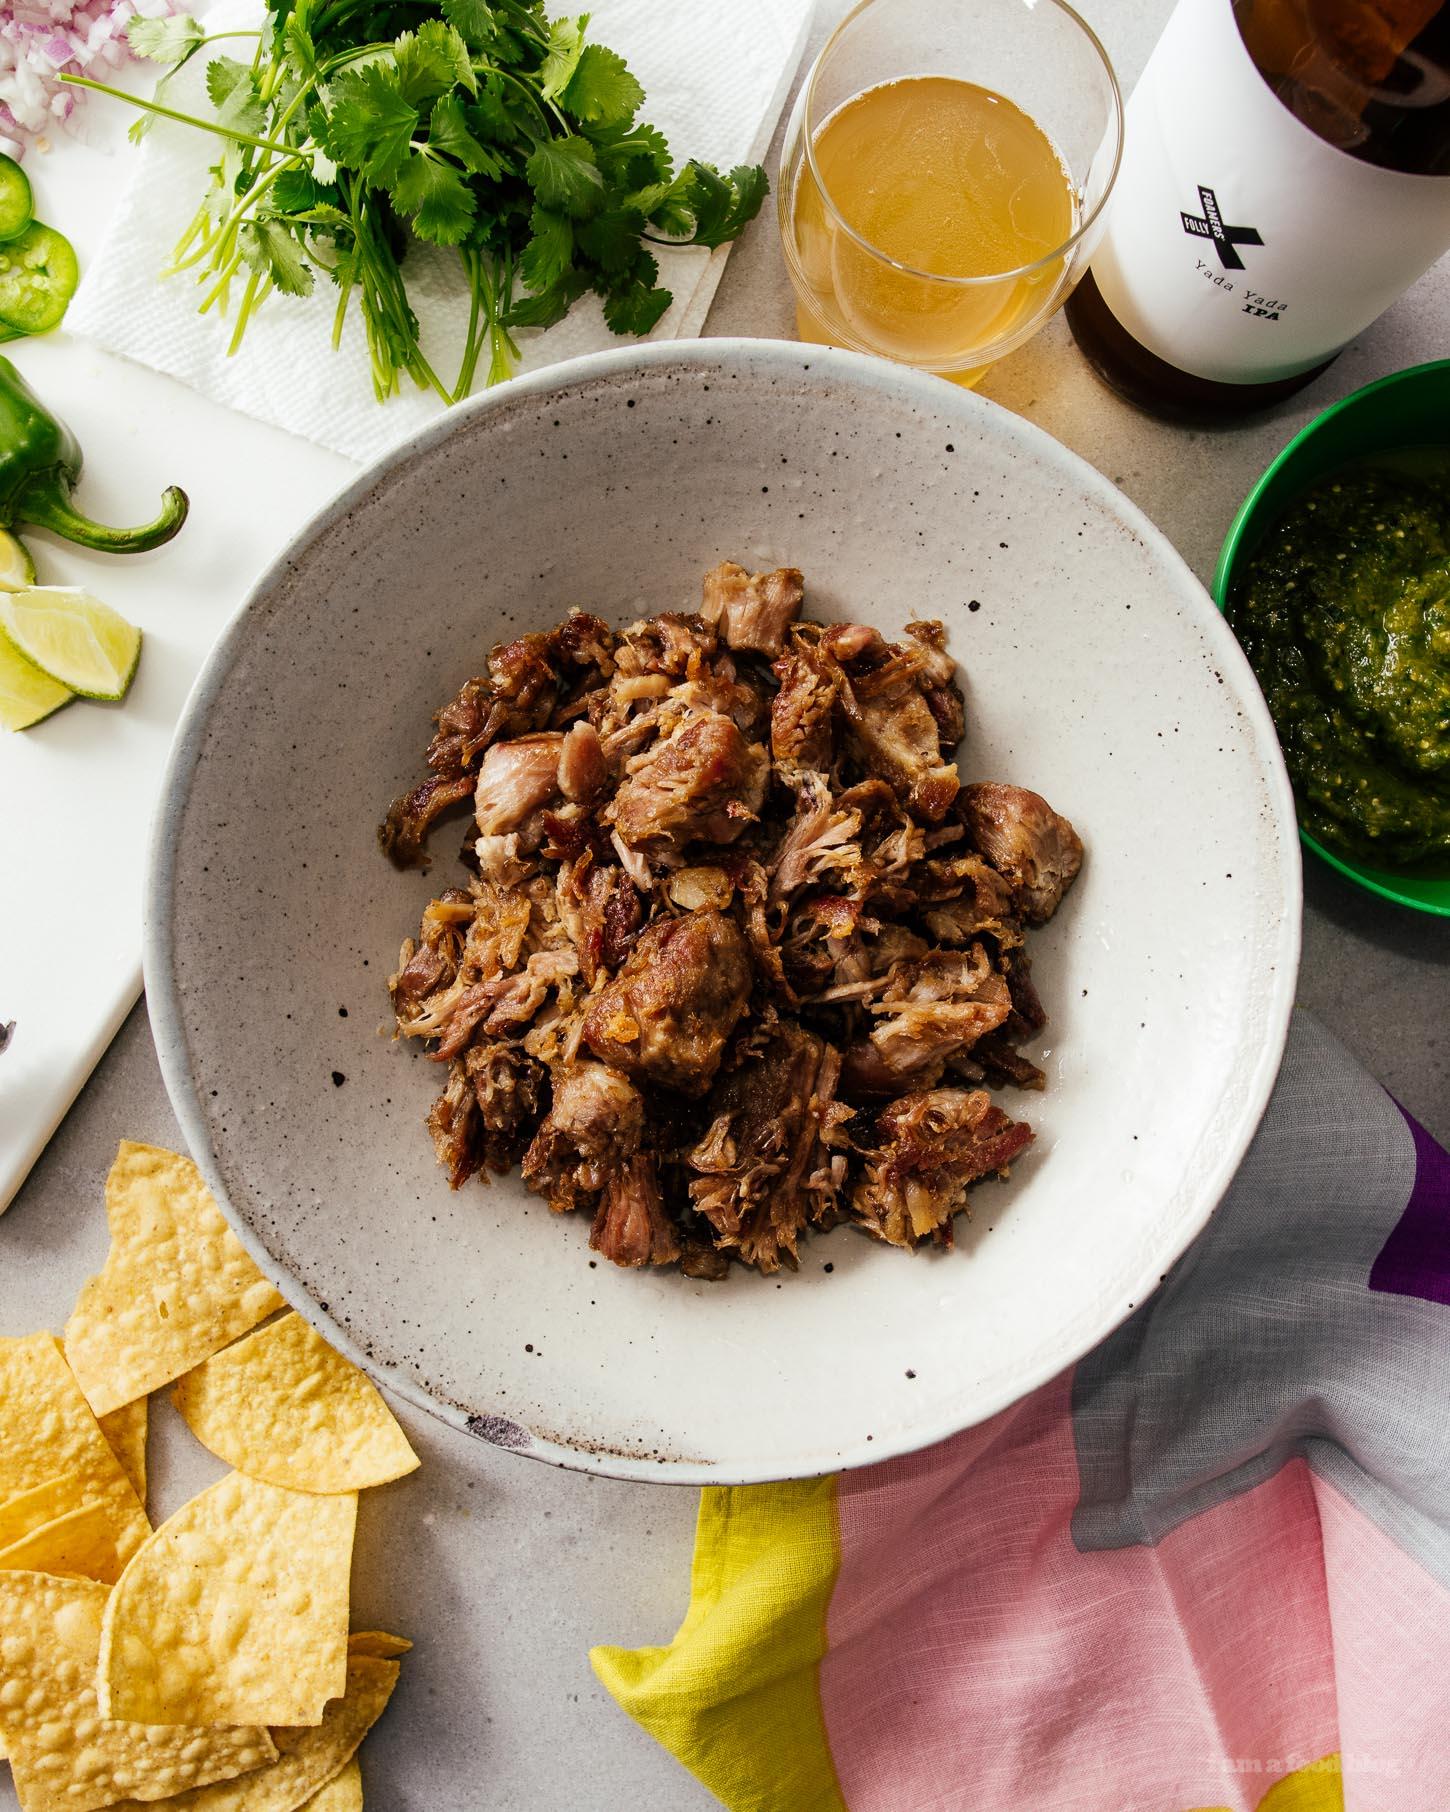 The Ultimate Easy 3 Ingredient Slow Cooker Pork Carnitas | www.iamafoodblog.com